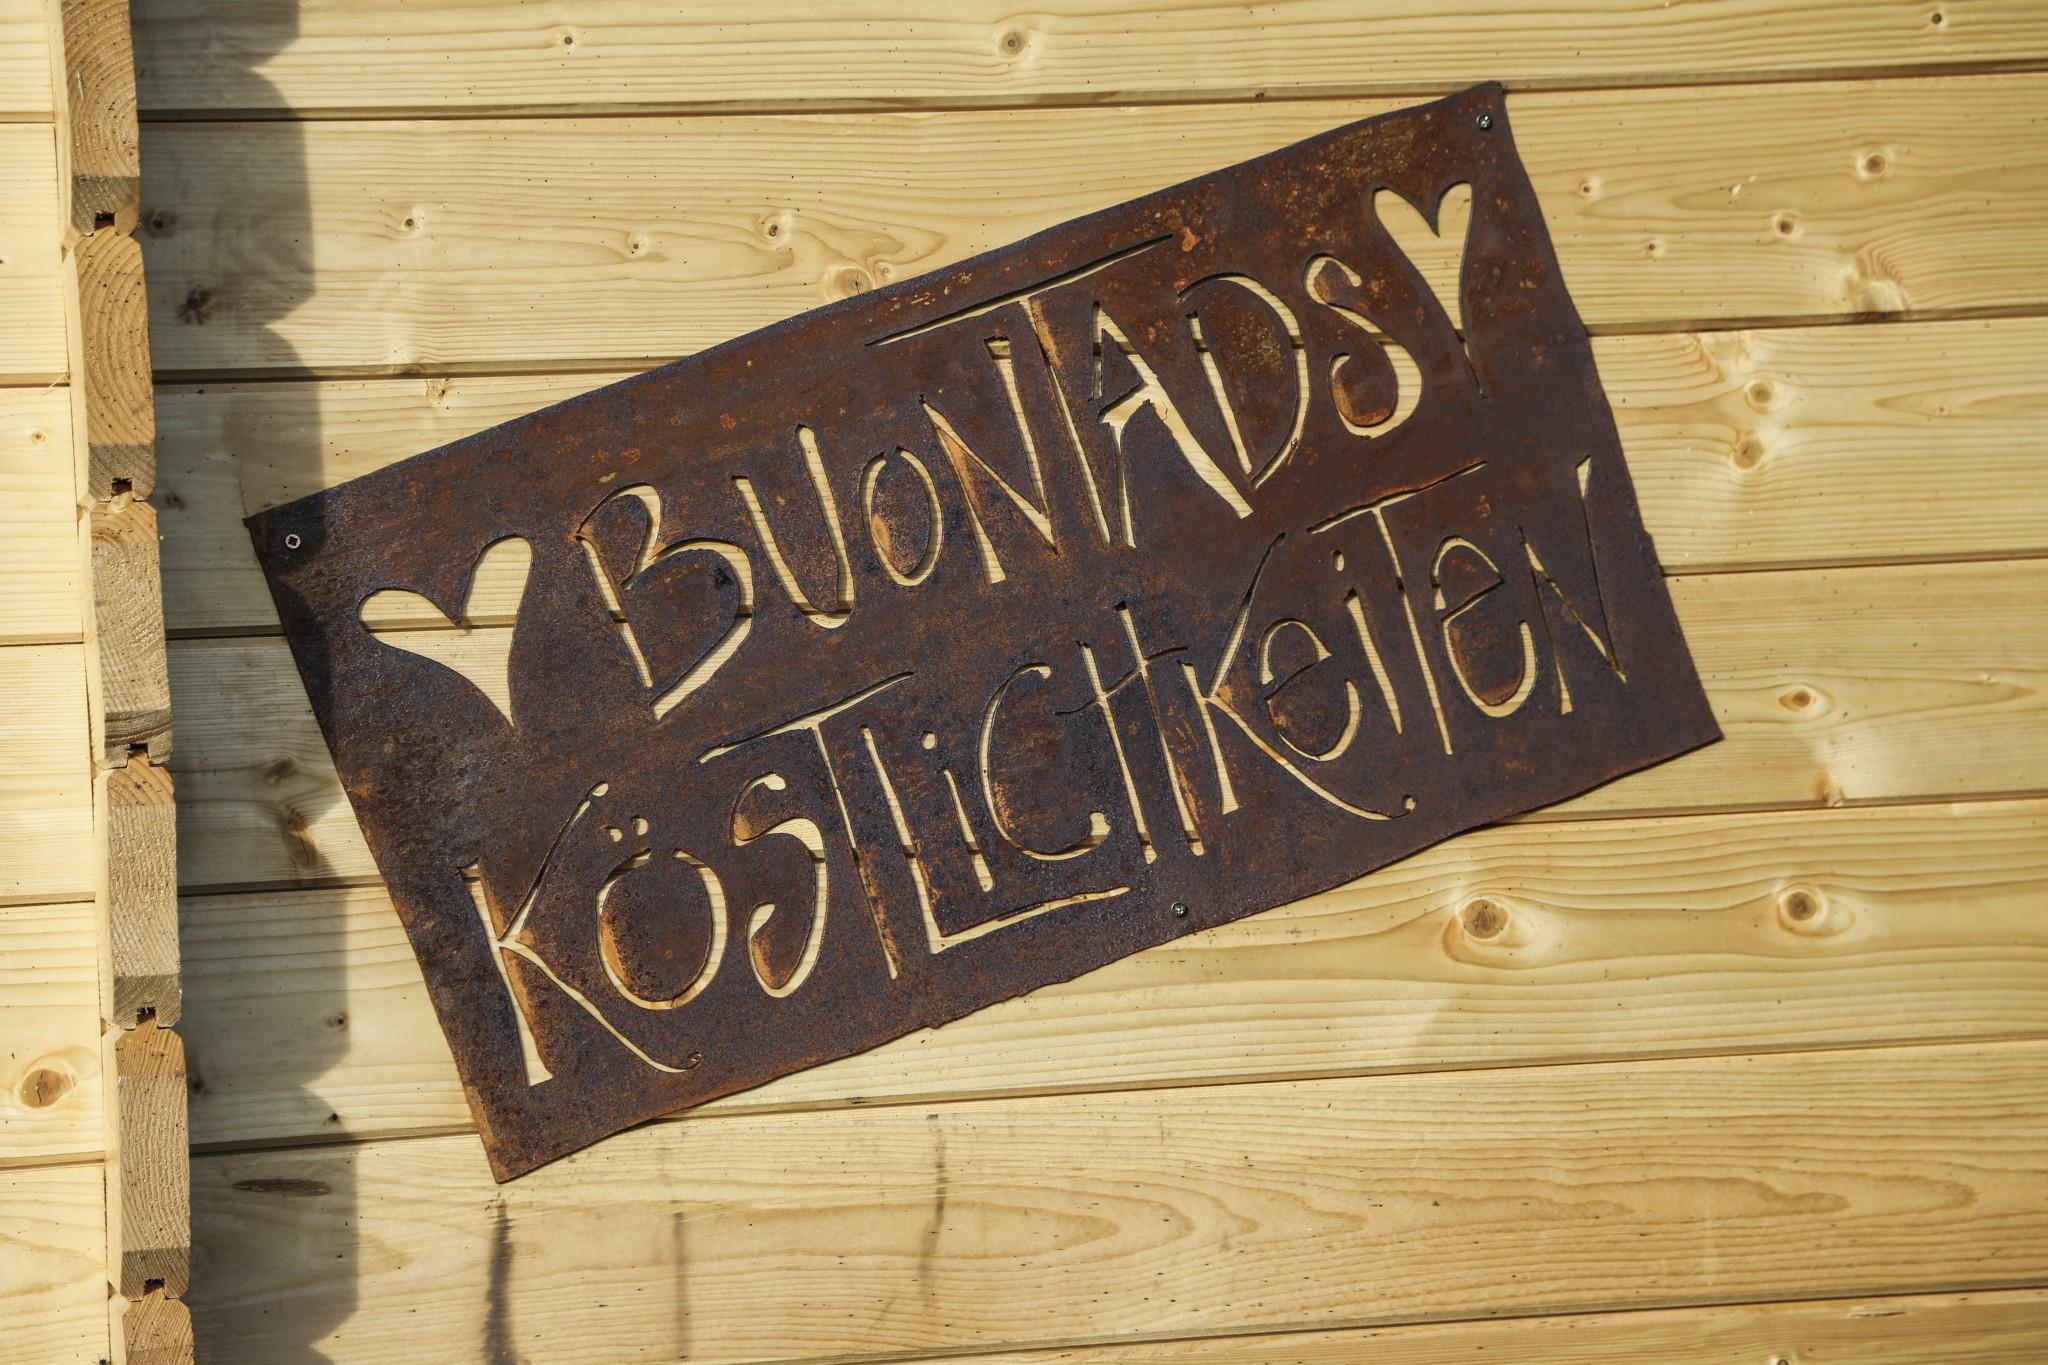 Buontads